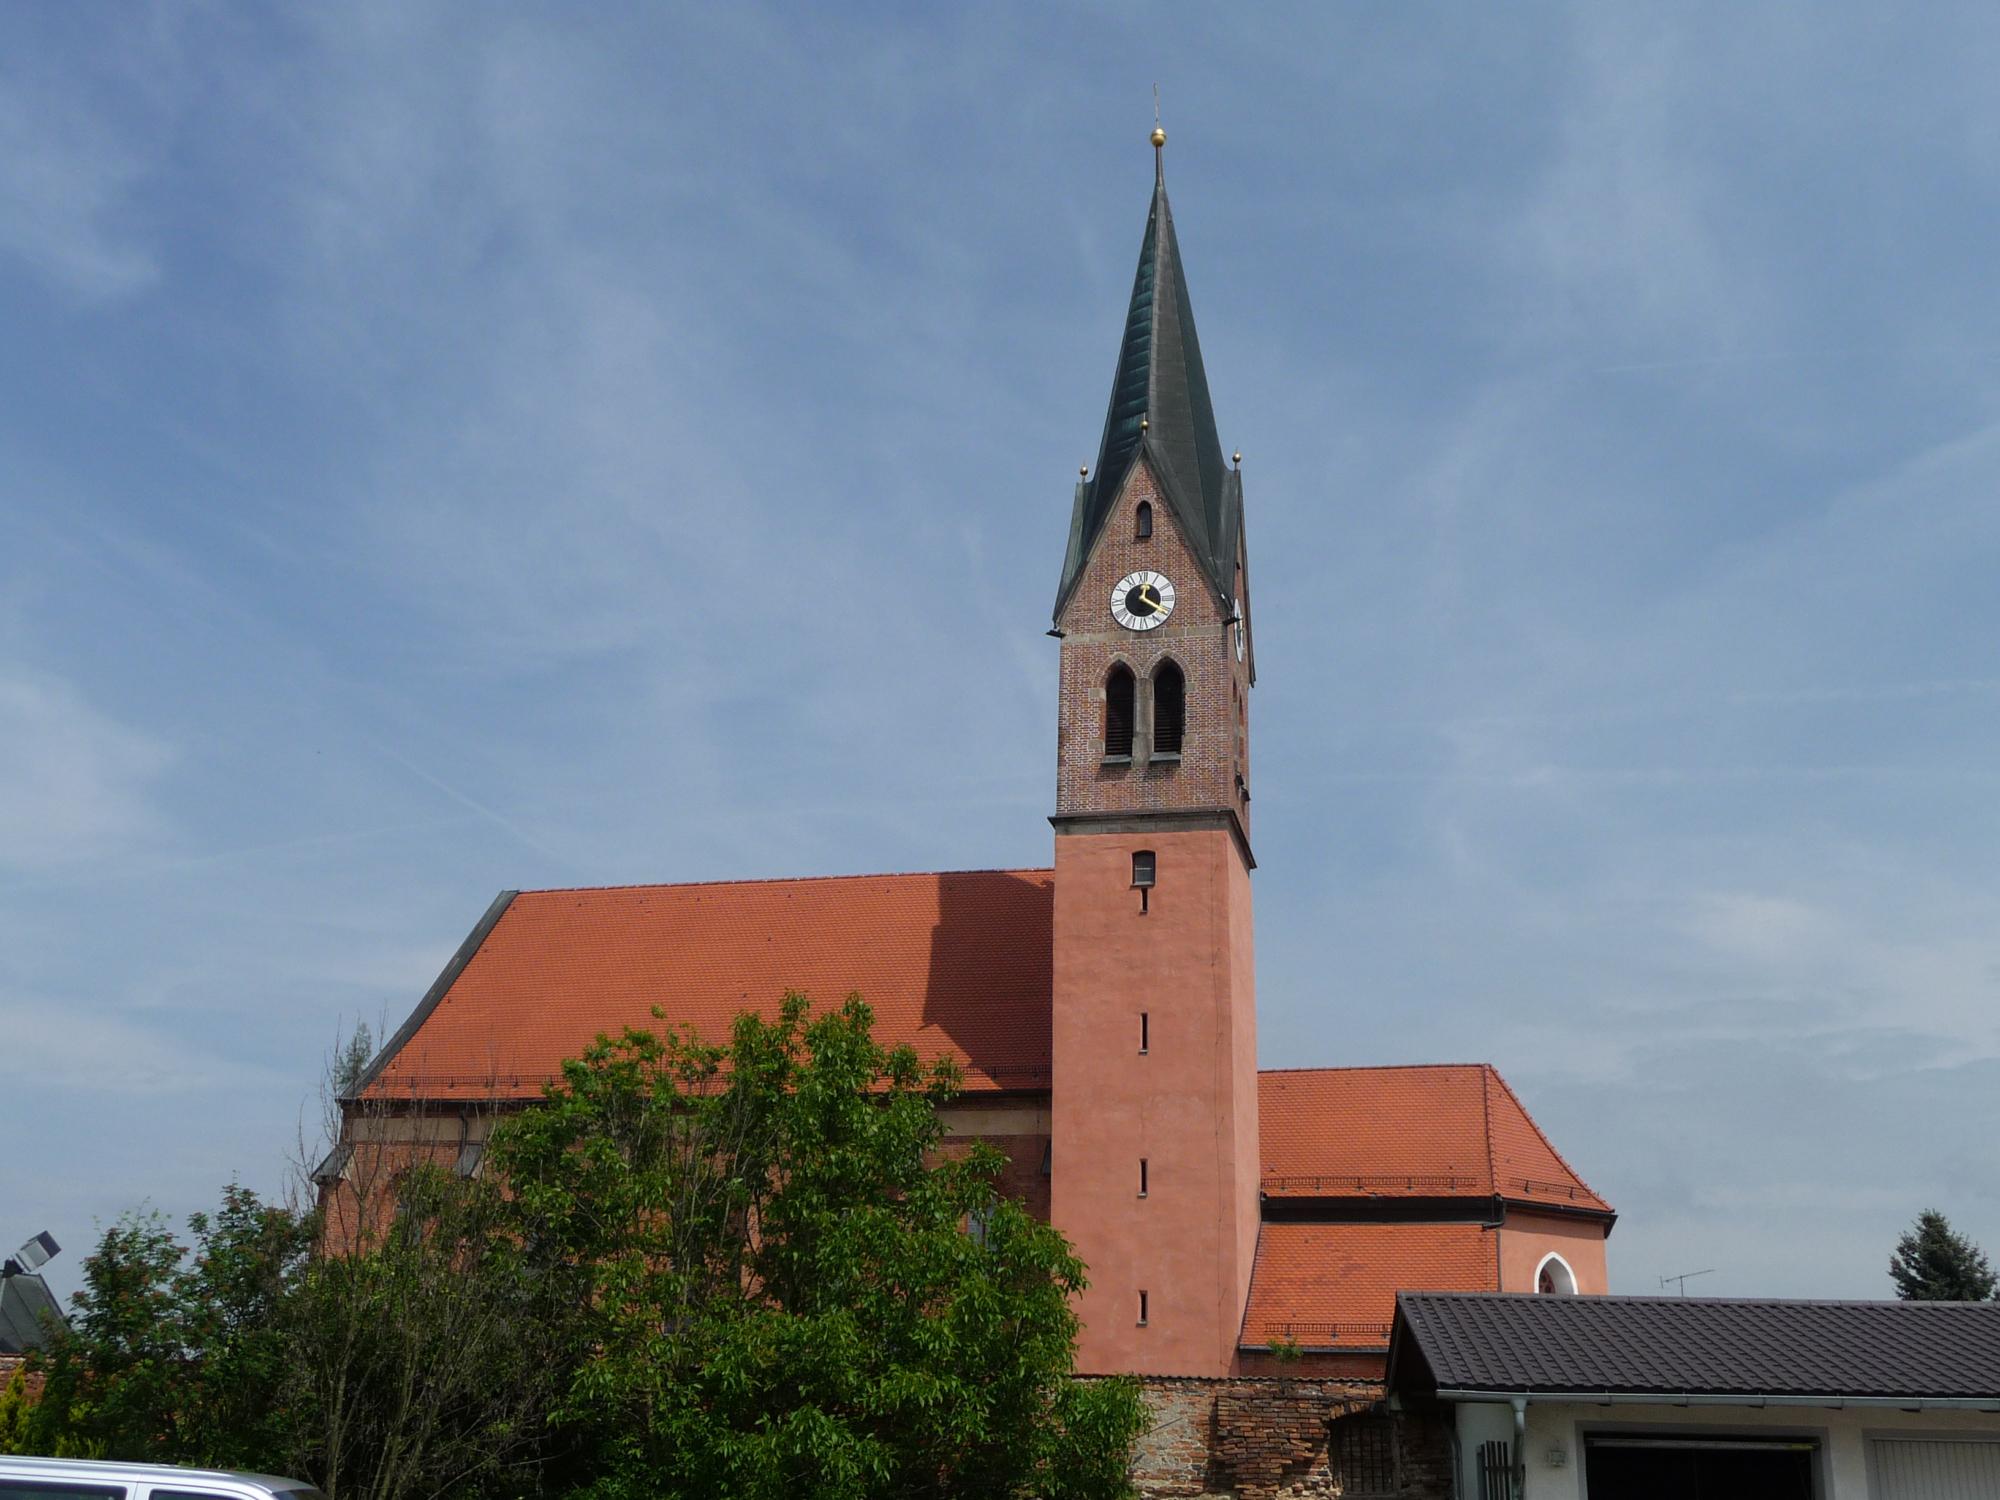 Pfarrkirche Schwanenkirchen